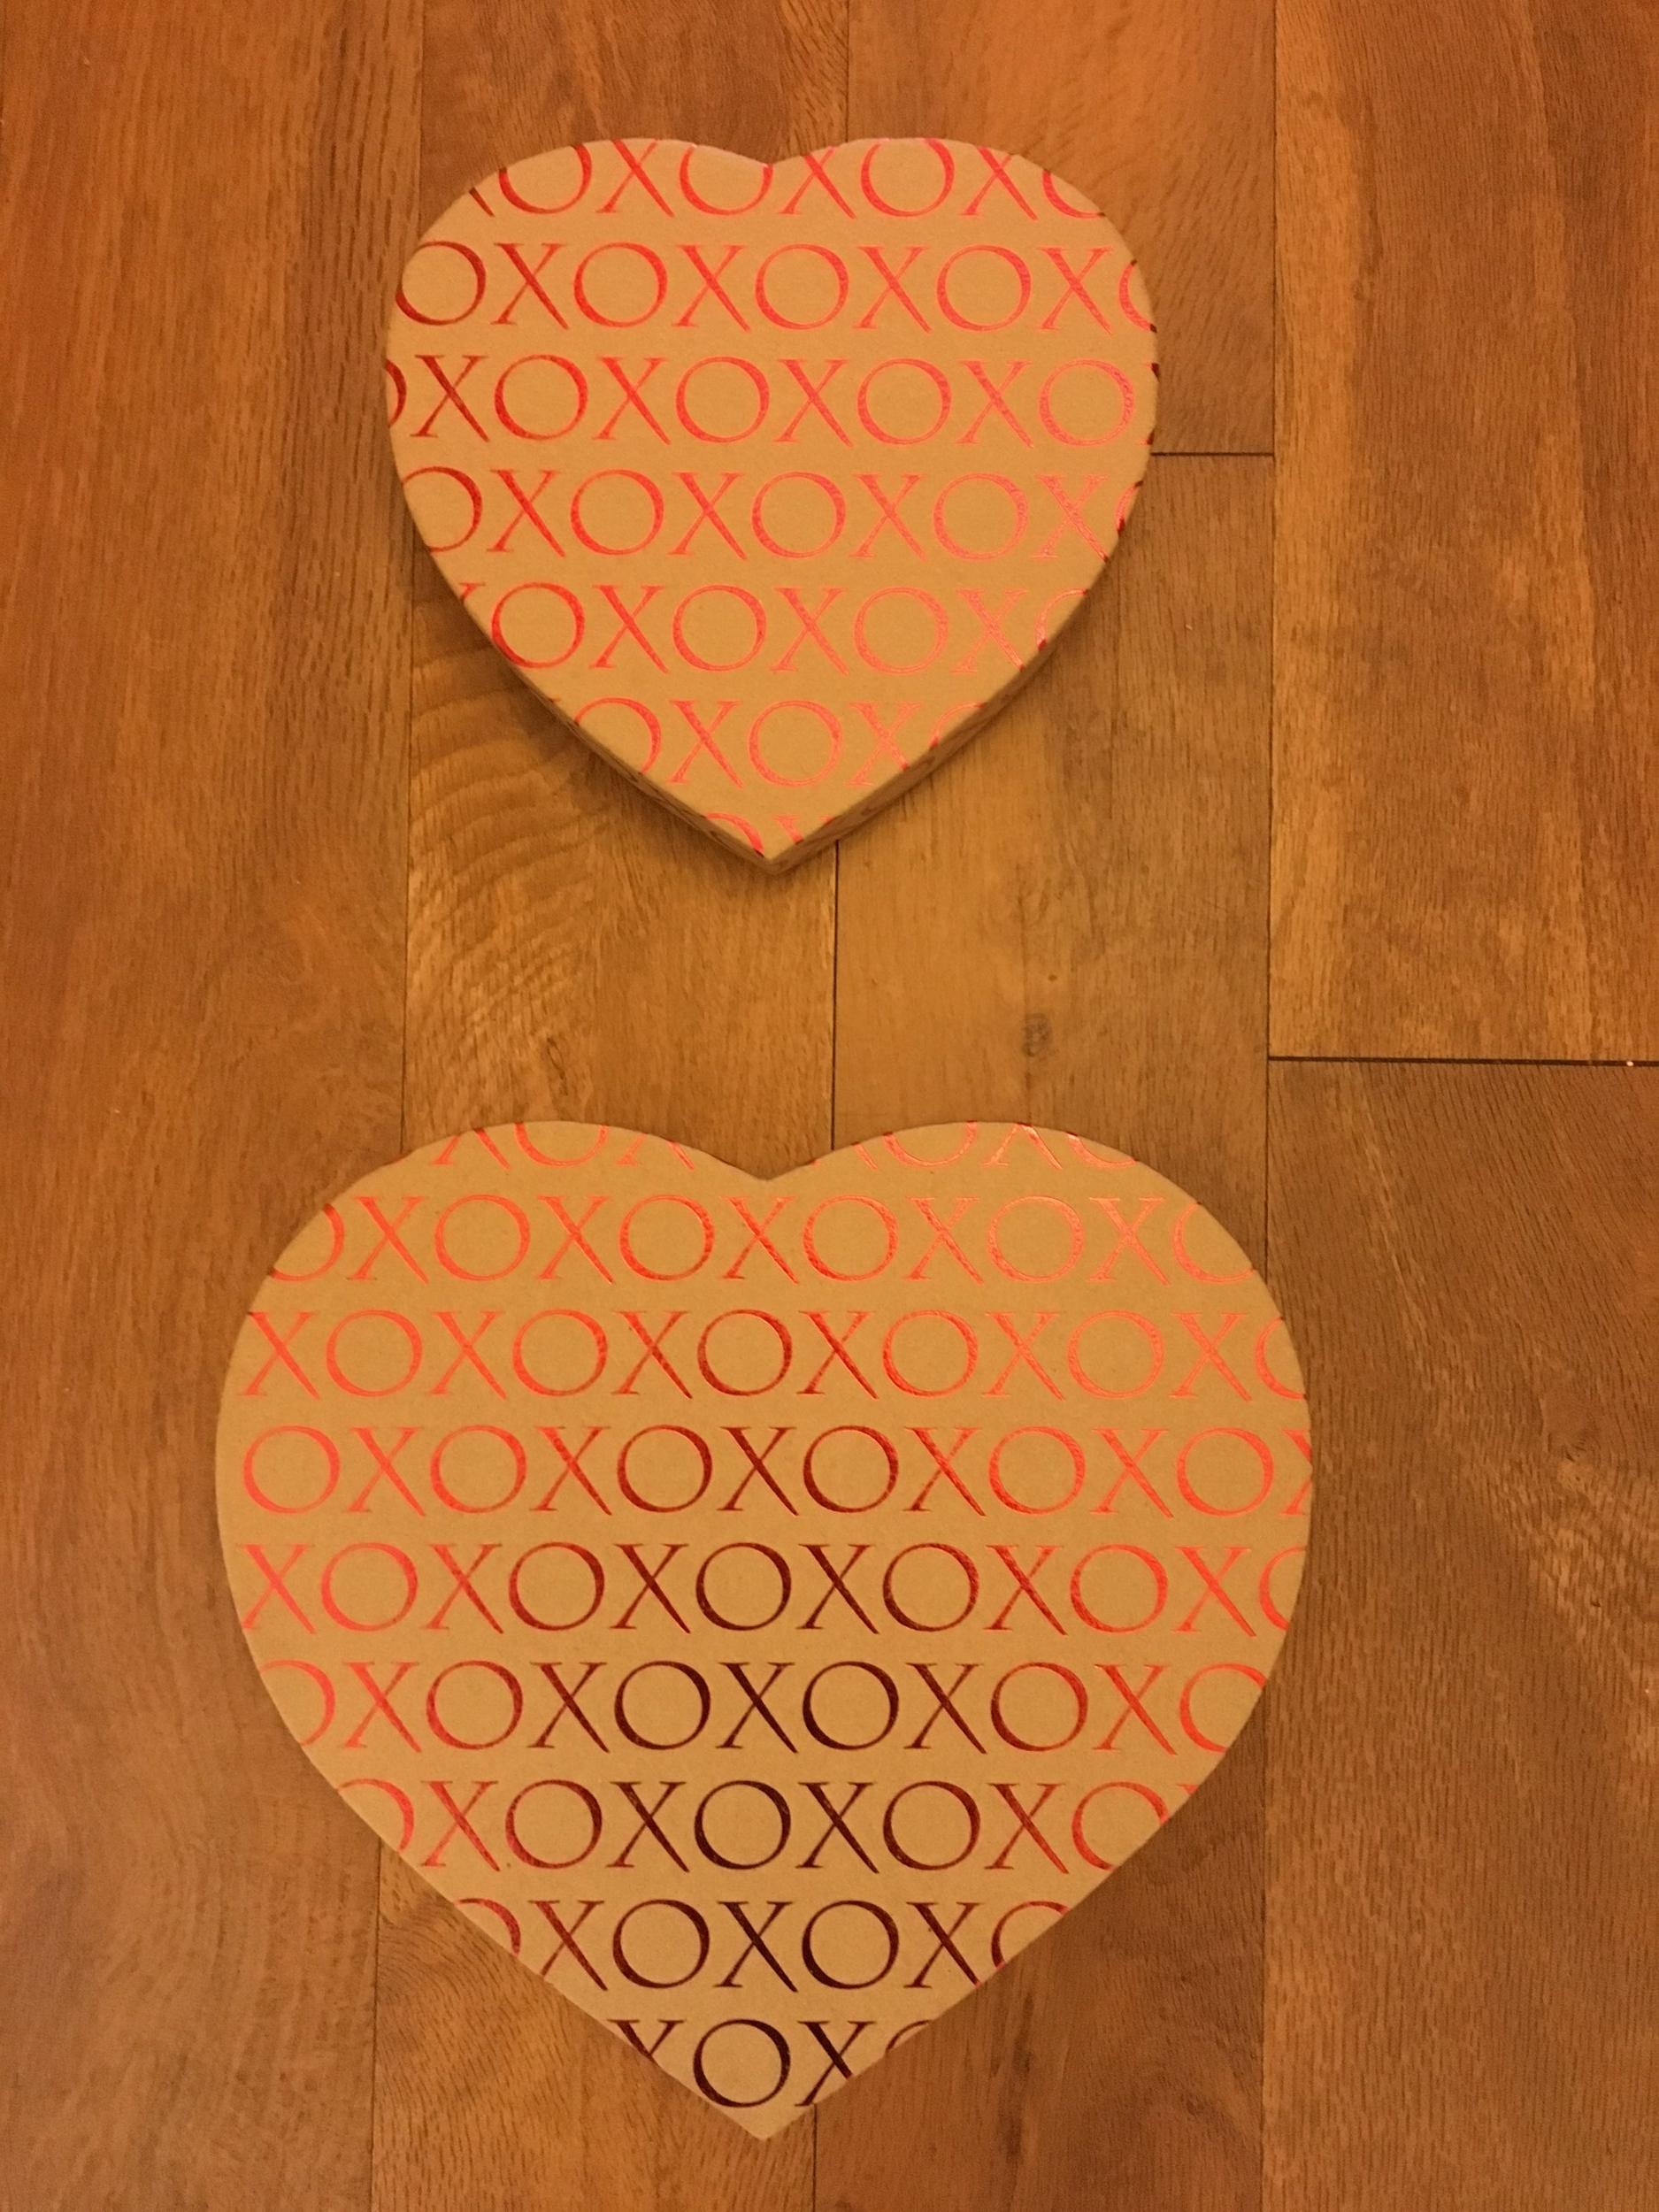 Kraft XOXO Heart Box   1 lb. box - $11.95 1/2 lb. box - $9.95  (Does not include candy)